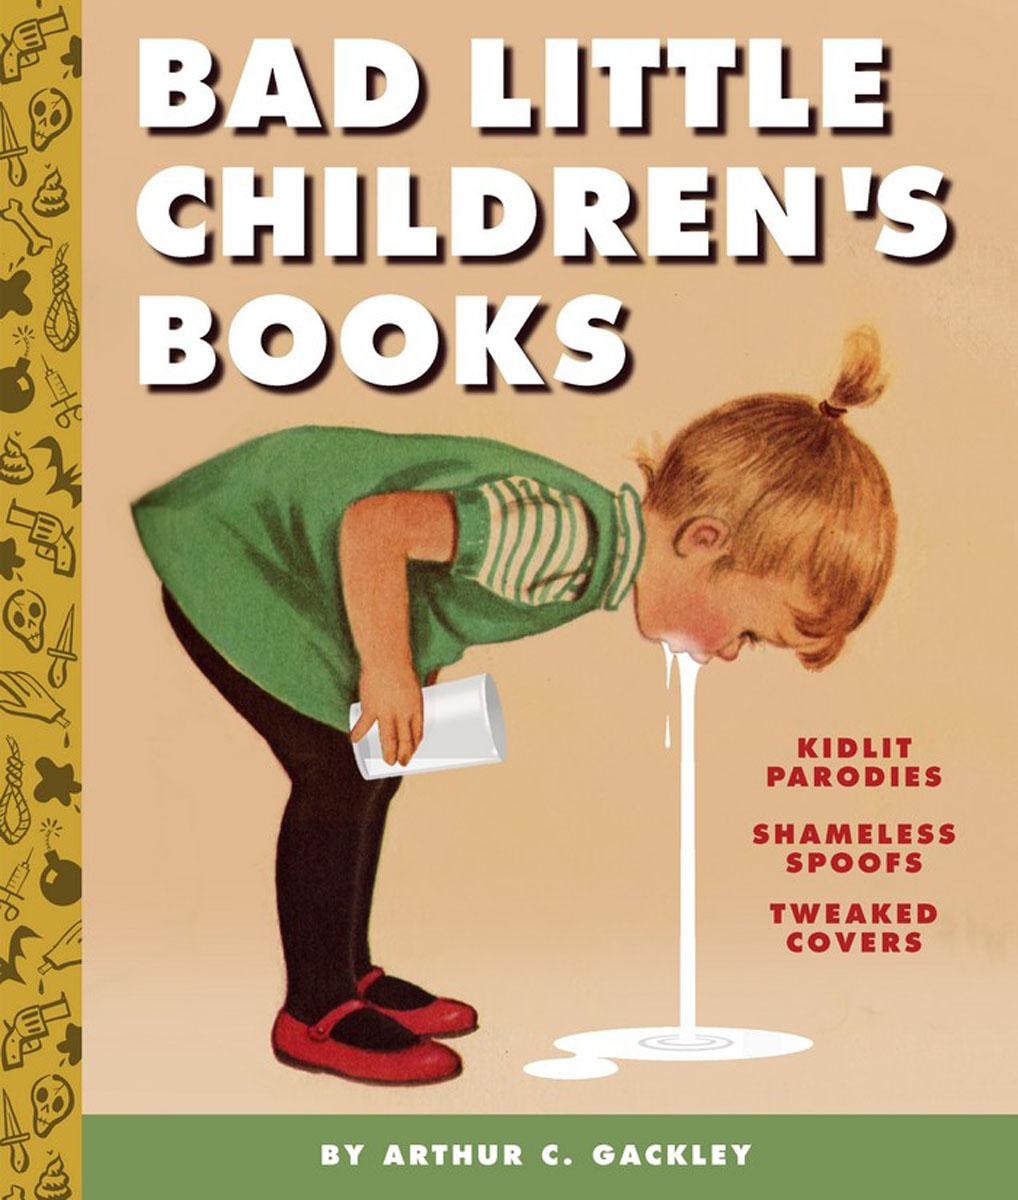 Bad Little Children's Books can t you sleep little bear libros infantiles original english books cuentos infantiles educativos children kids picture book